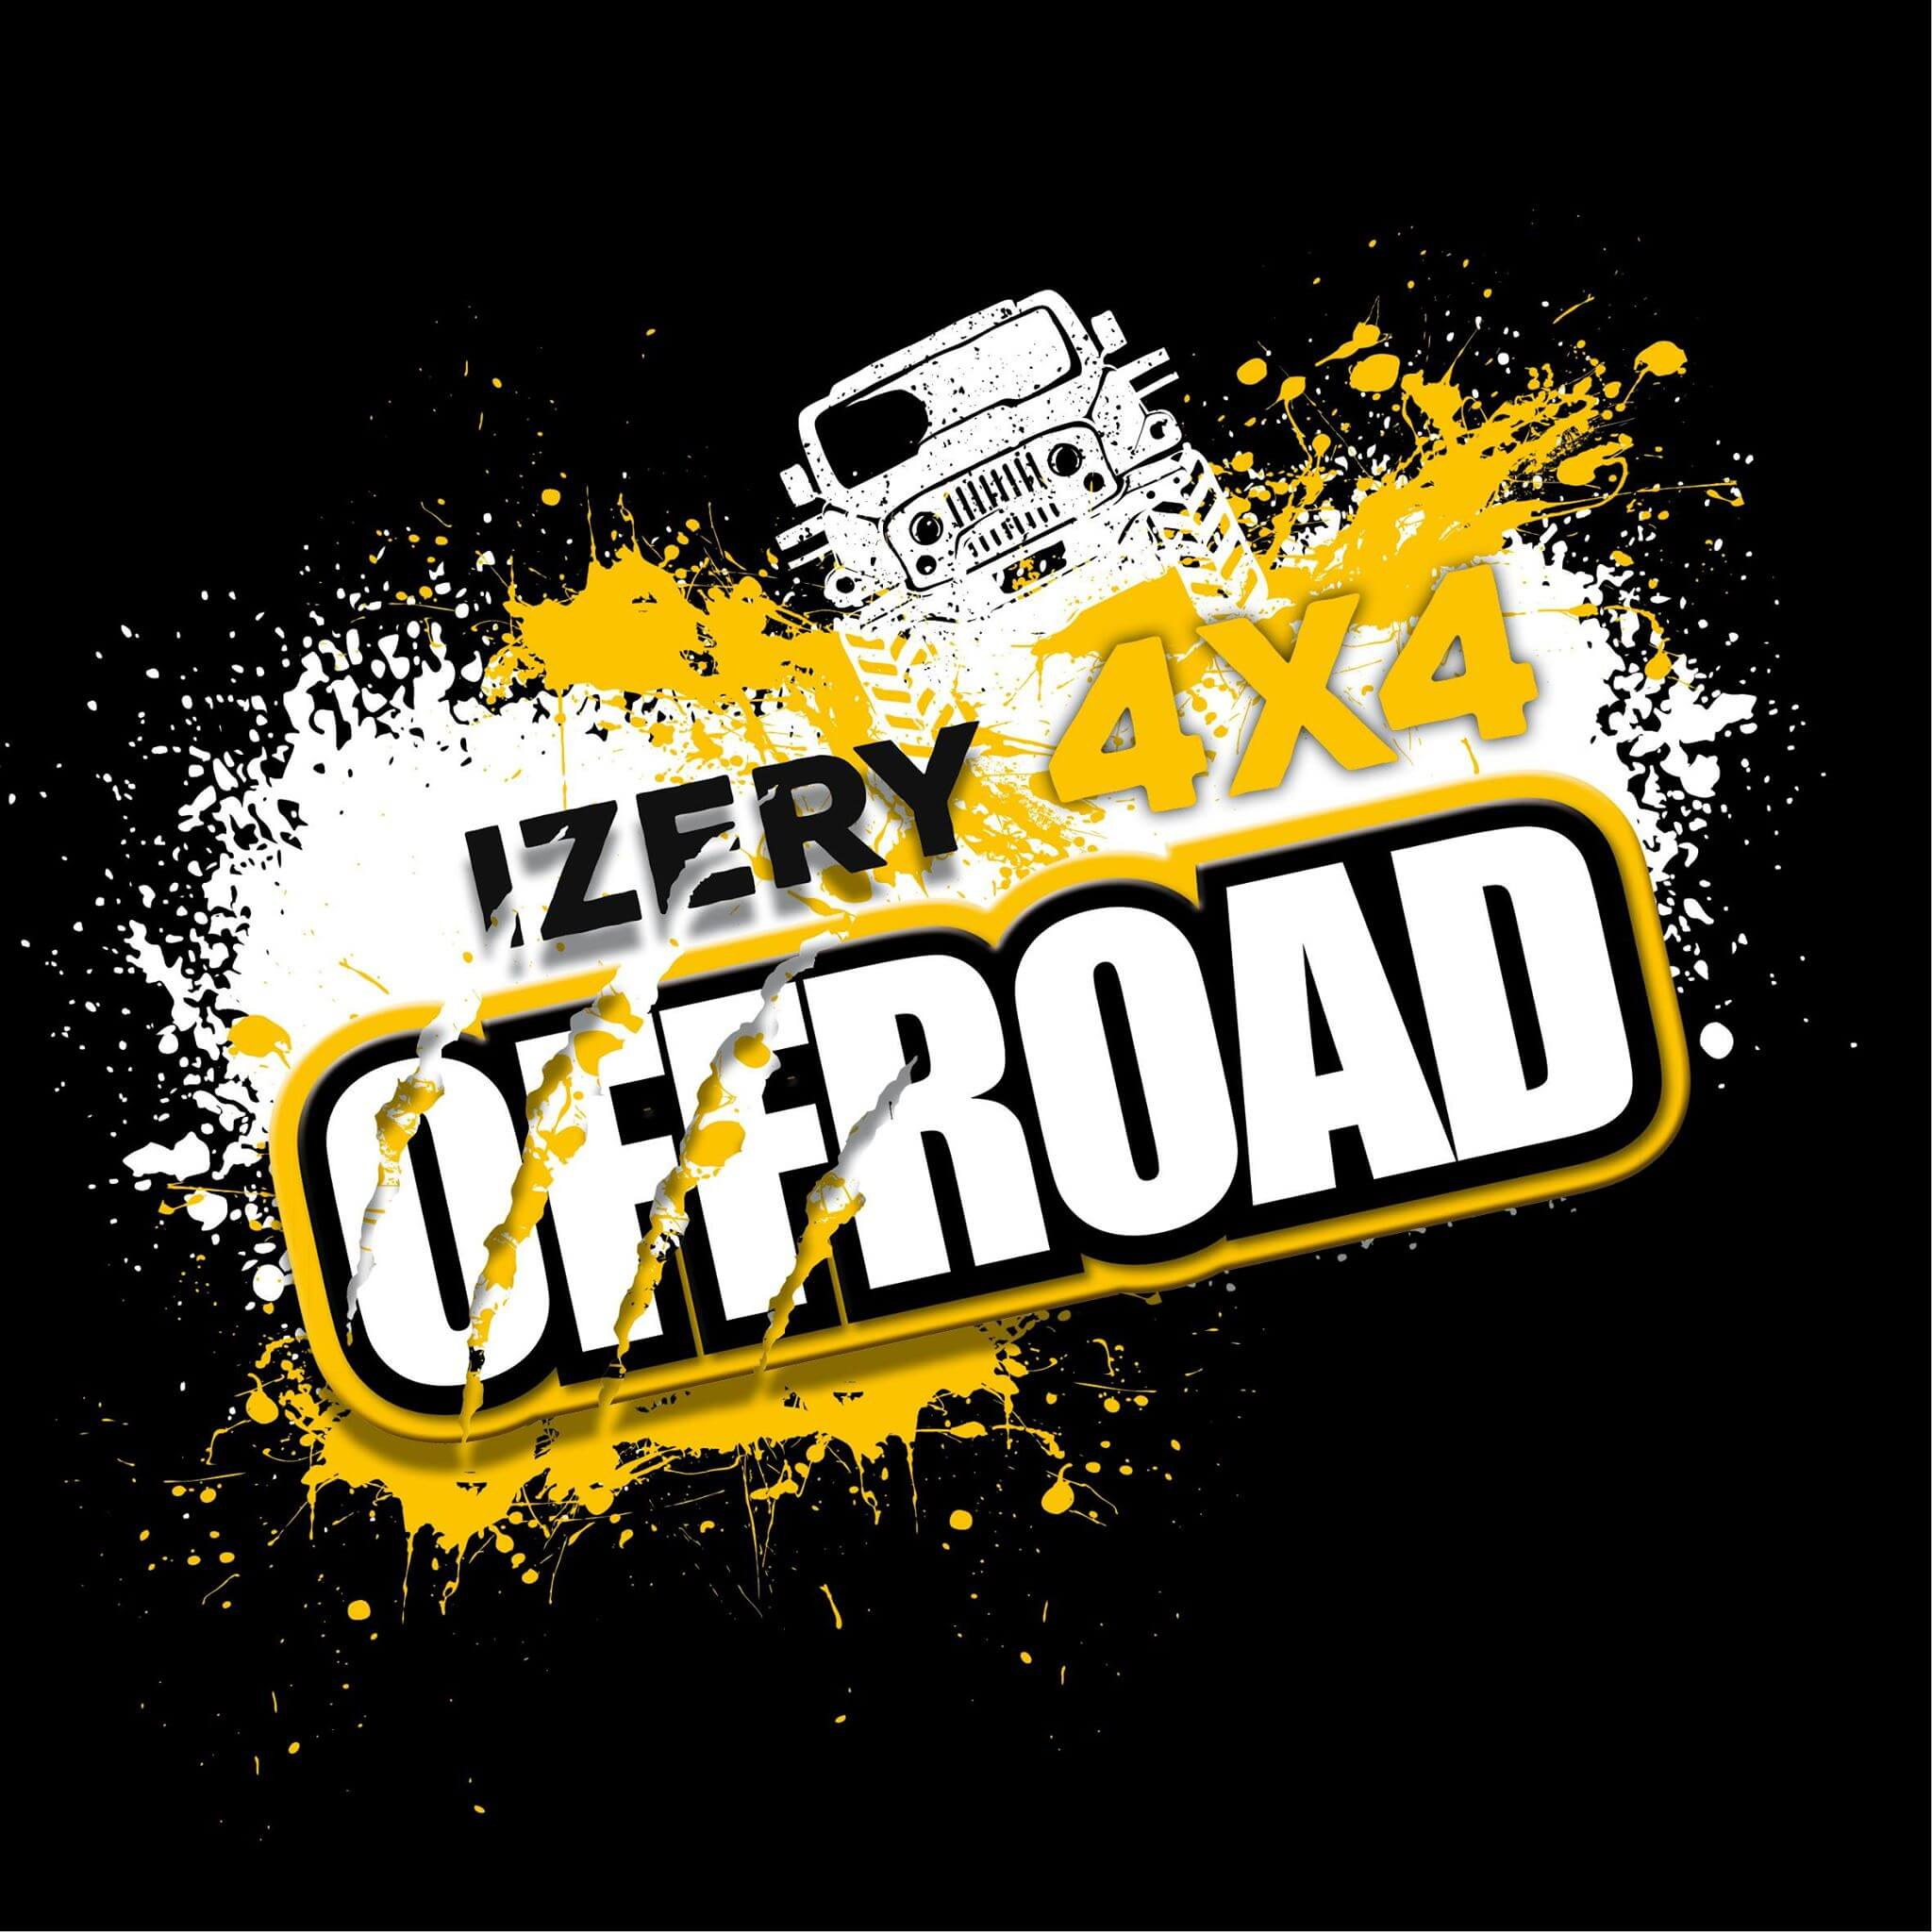 Izery 4X4 Offroad